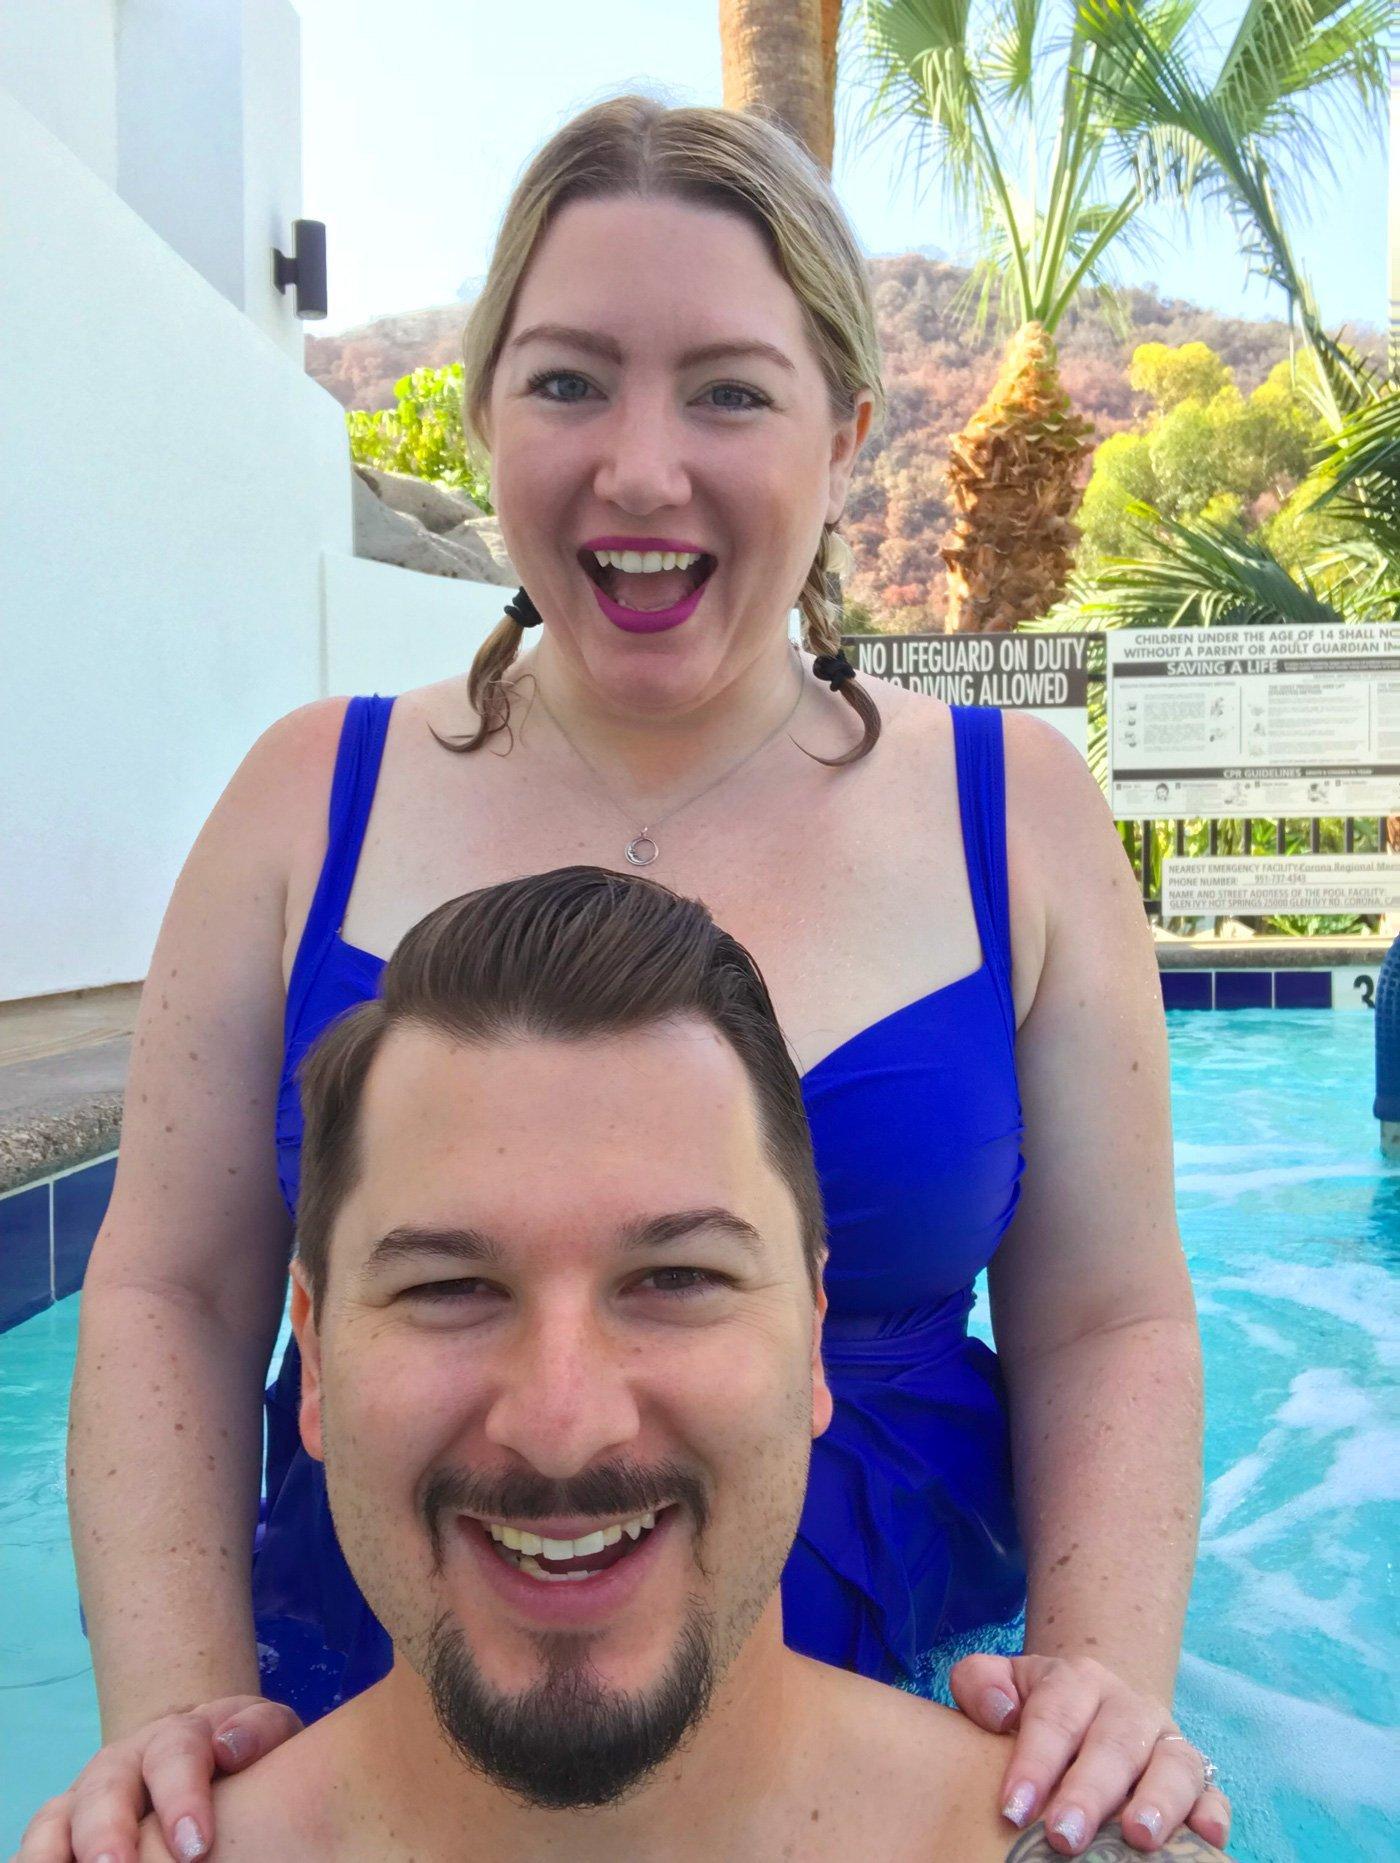 Natasha & Jarod Octon having fun in the Ivy Terrace Spa Pool.